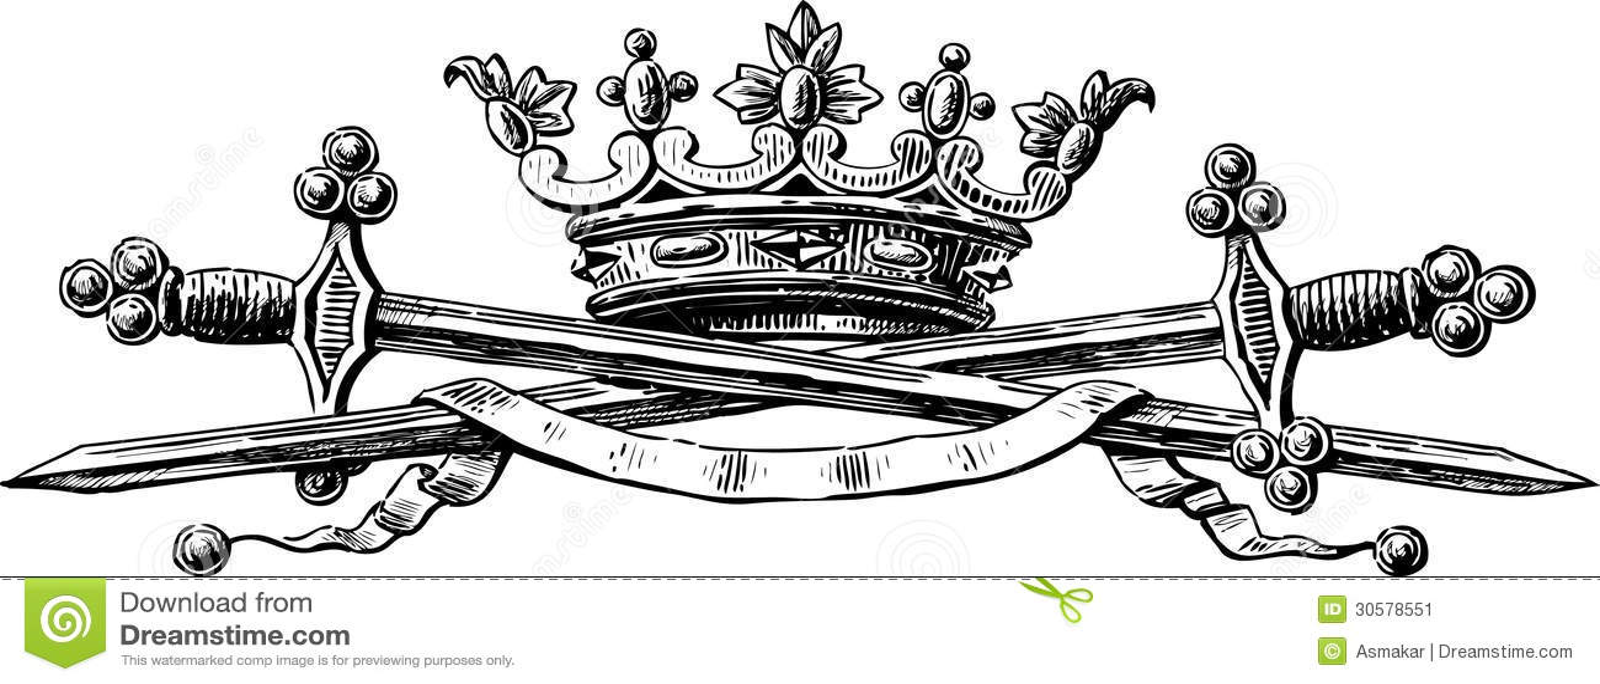 Symbols Of Power Stock Vector Illustration Of Heraldry 30578551